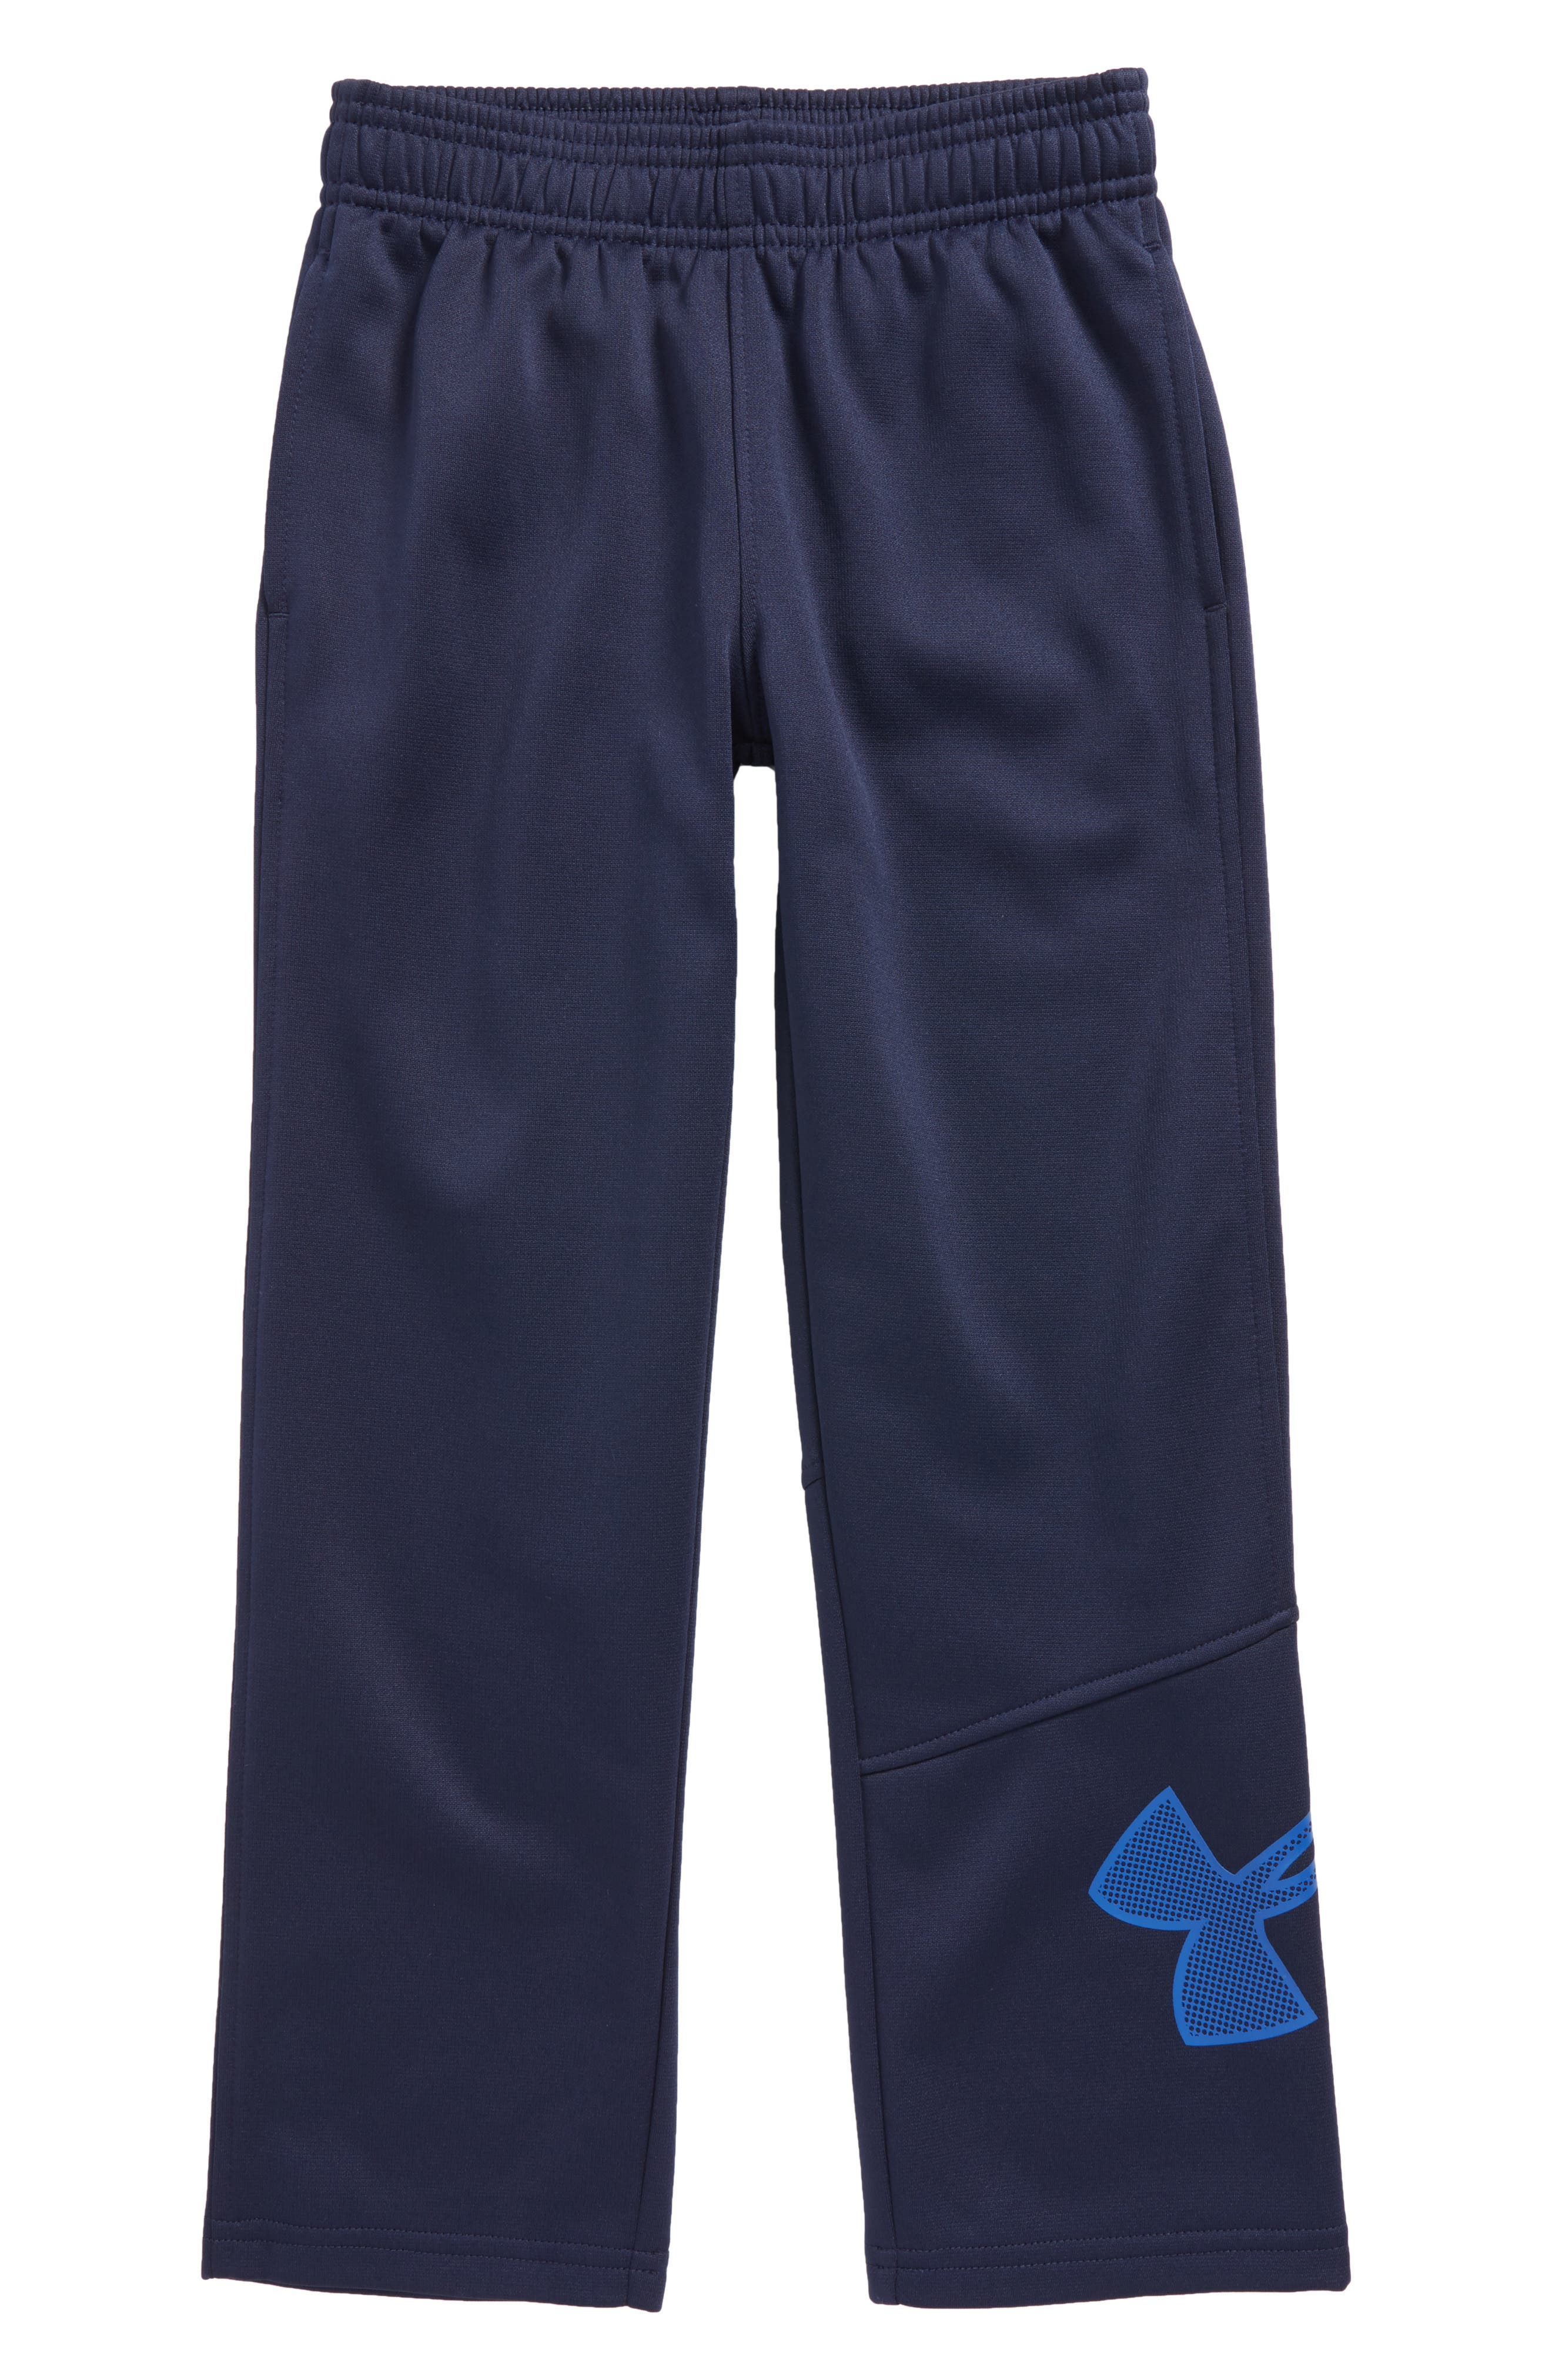 Under Armour Big Logo Fleece Pants (Toddler Boys & Little Boys)